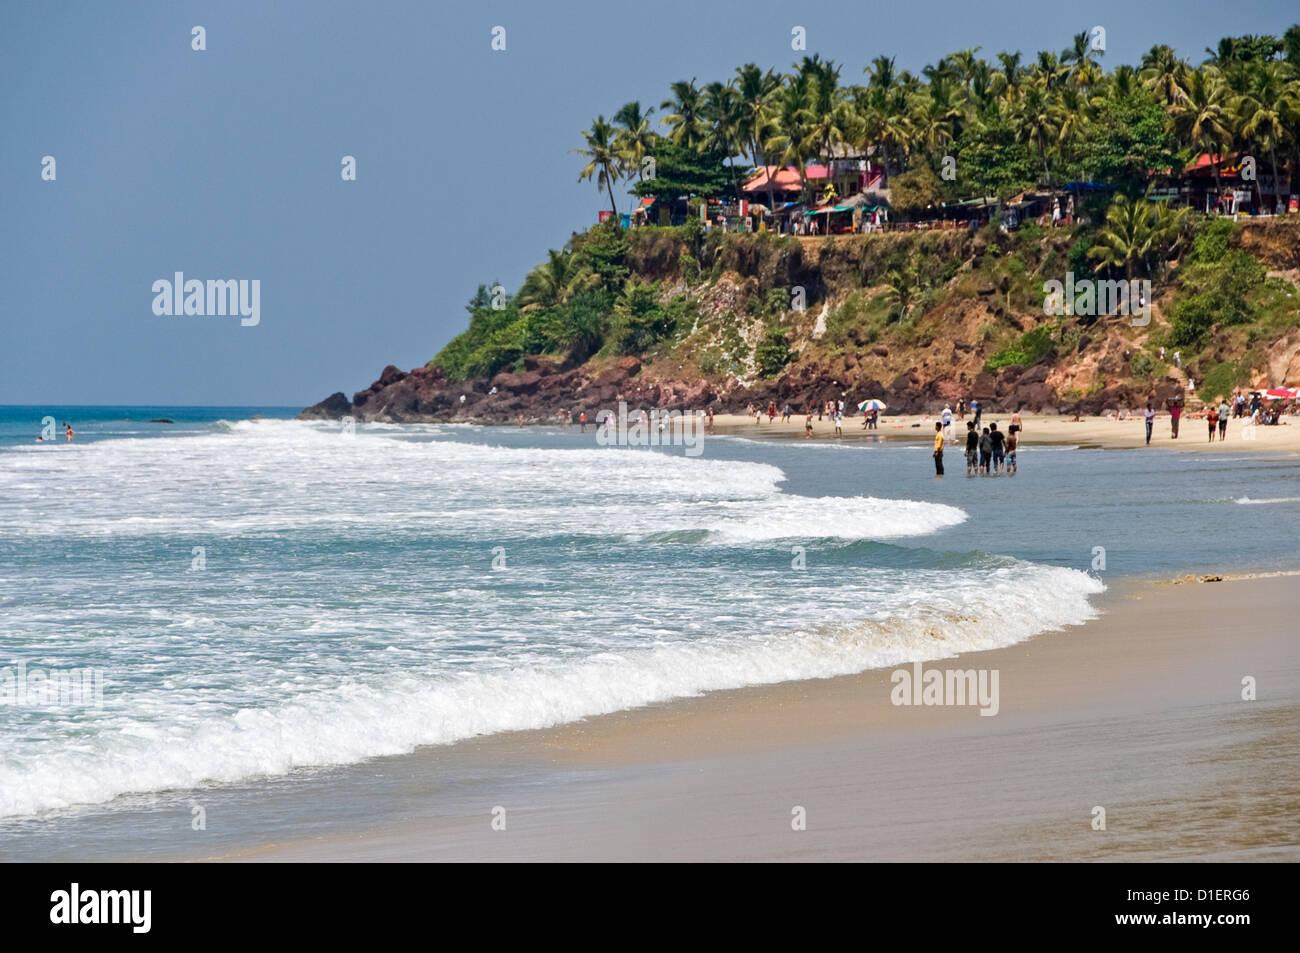 Horizontal view of the unique cliffs on Papanasam beach at Varkala, Kerala. - Stock Image